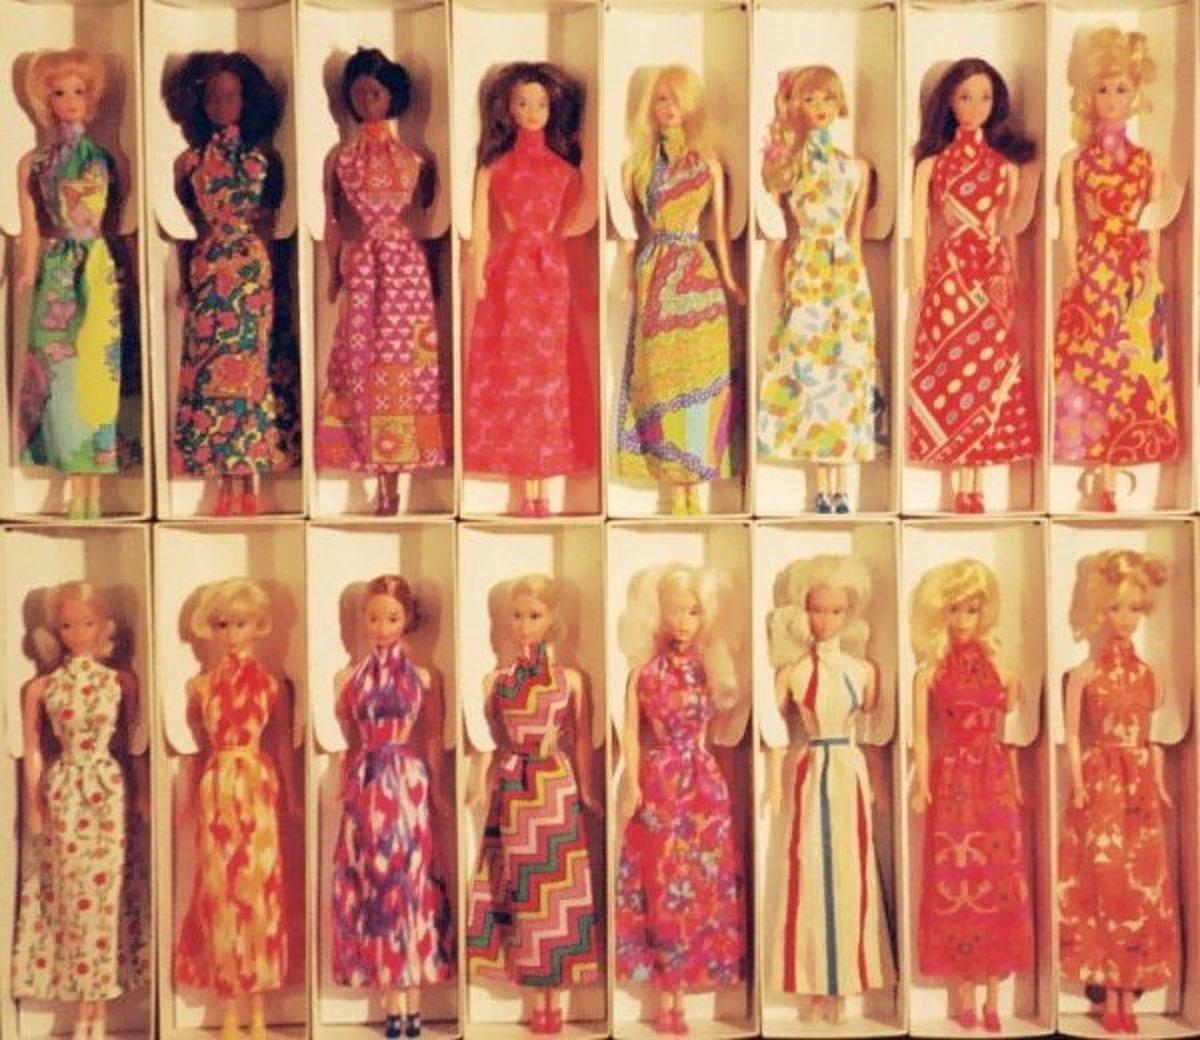 Barbie fashion #8680